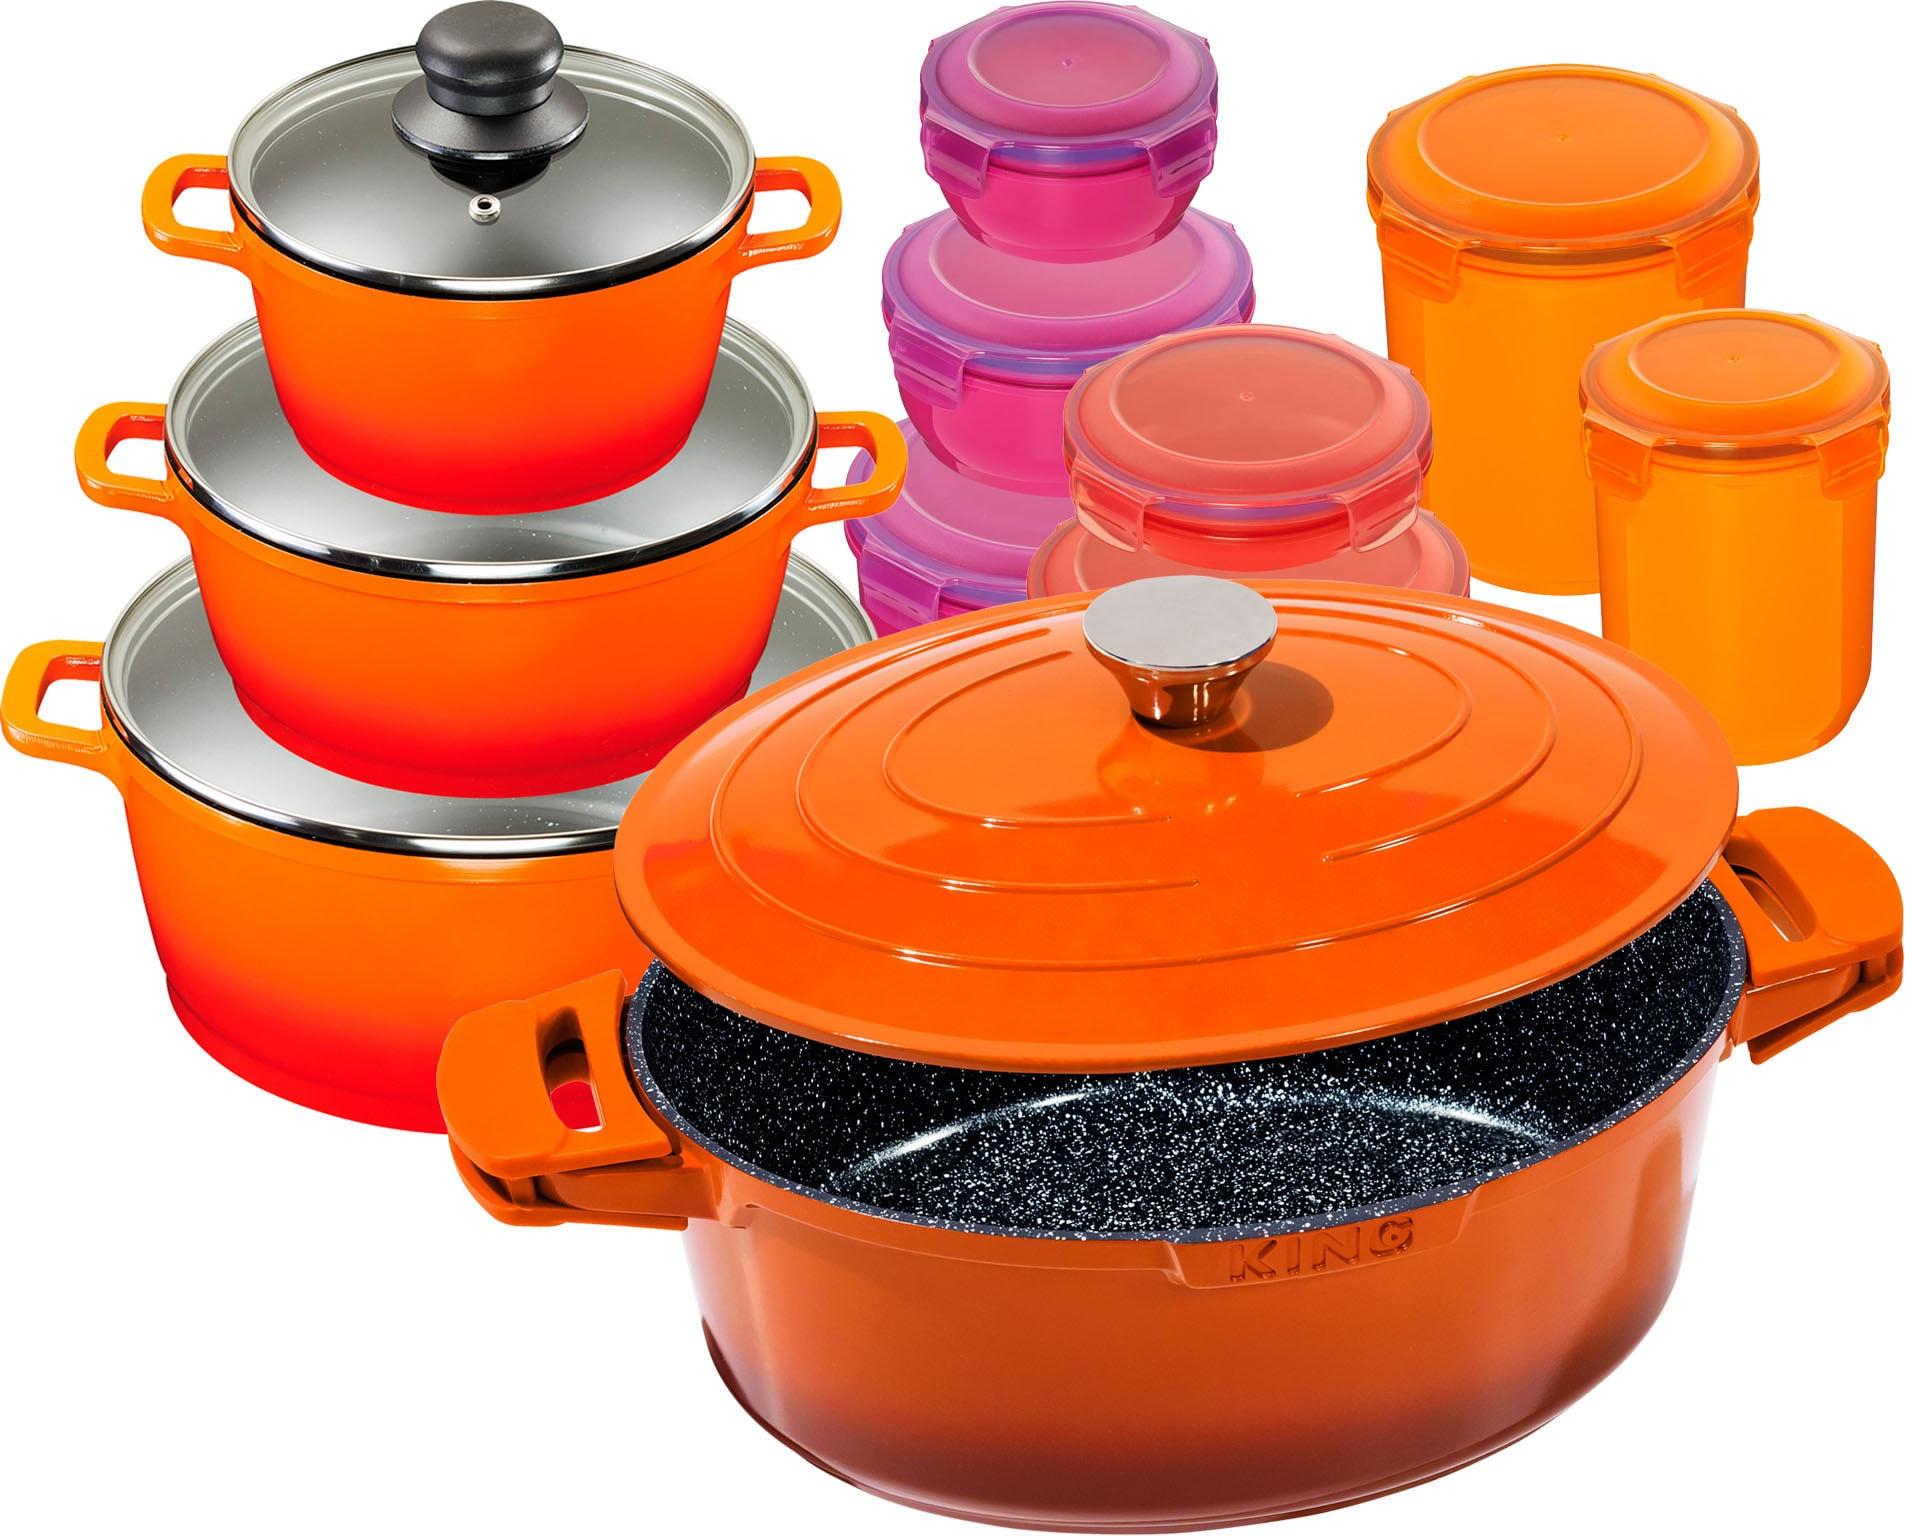 KING Topf-Set Shine Orange, Aluminiumguss, (Set, 11 tlg., 3 Töpfe, Deckel, 1 Bräter m. 7 Dosen), Induktion orange Topfsets Töpfe Haushaltswaren